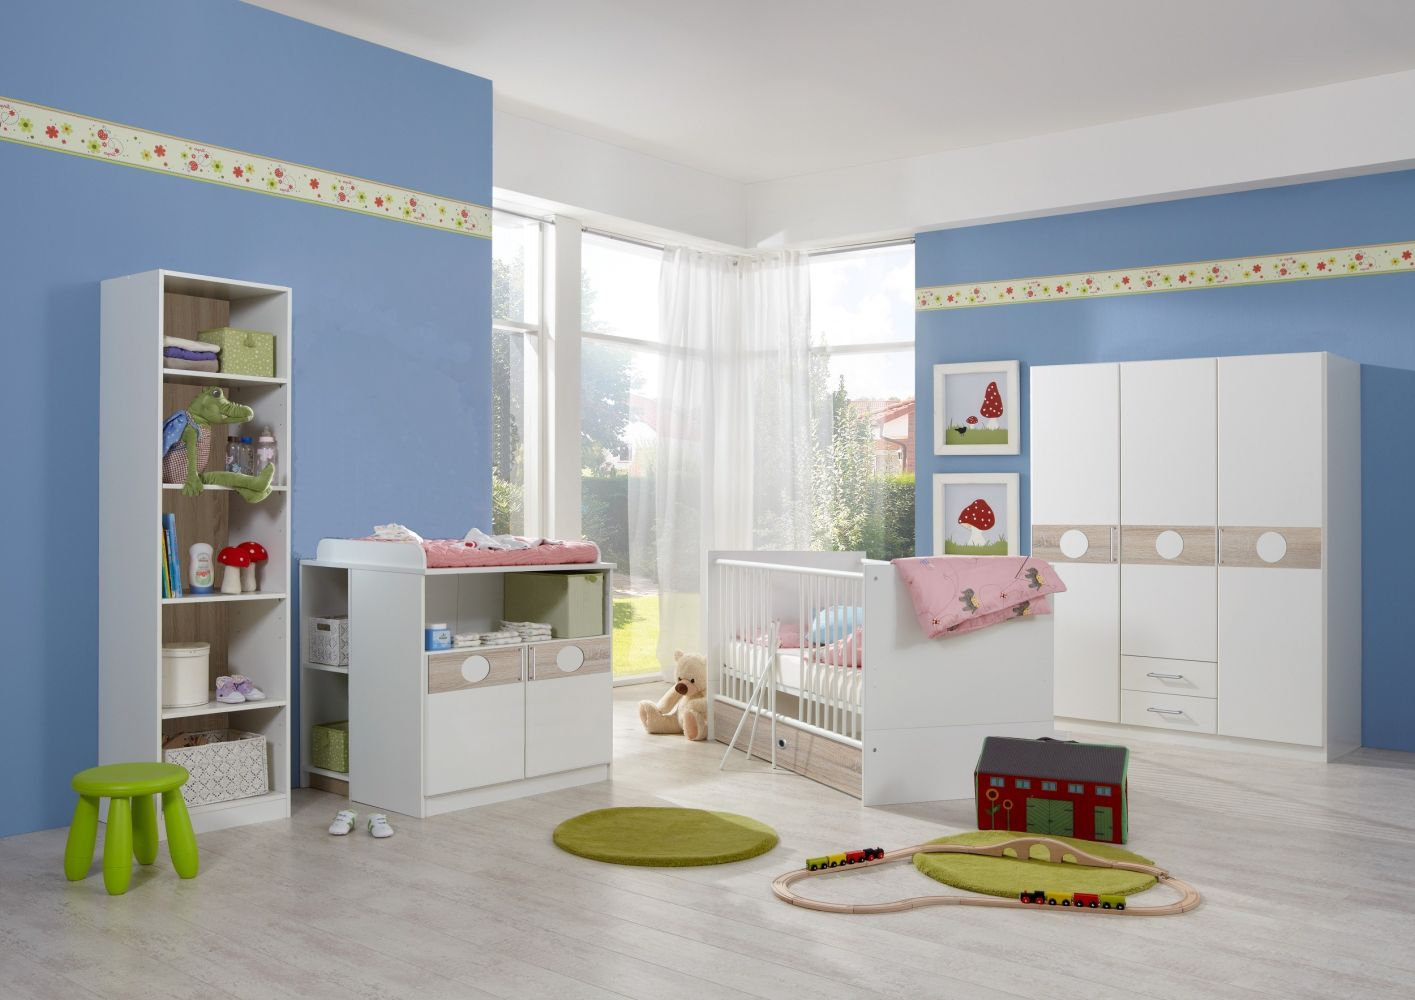 Babyzimmer-Set KIMBA 4tlg Komplett-Set Bild 1